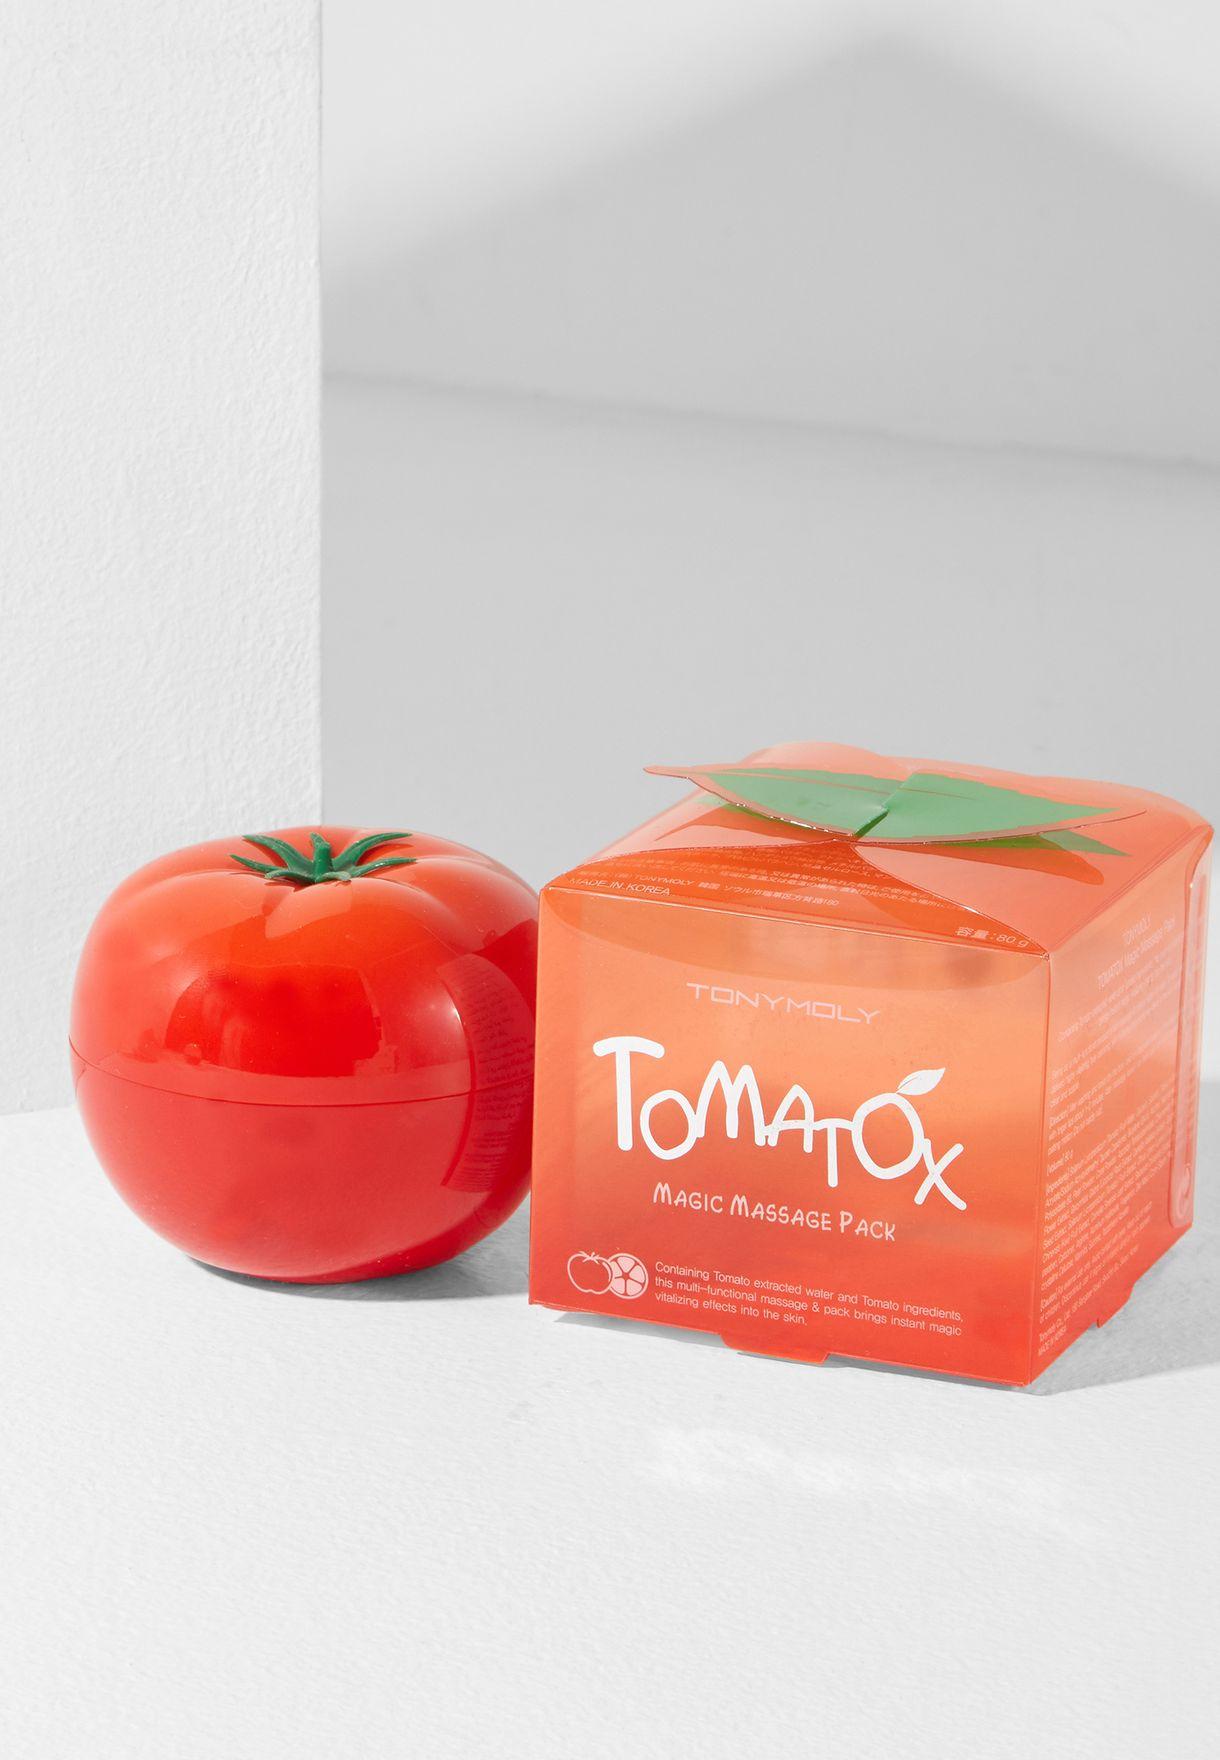 Tomatox Magic Massage Pack